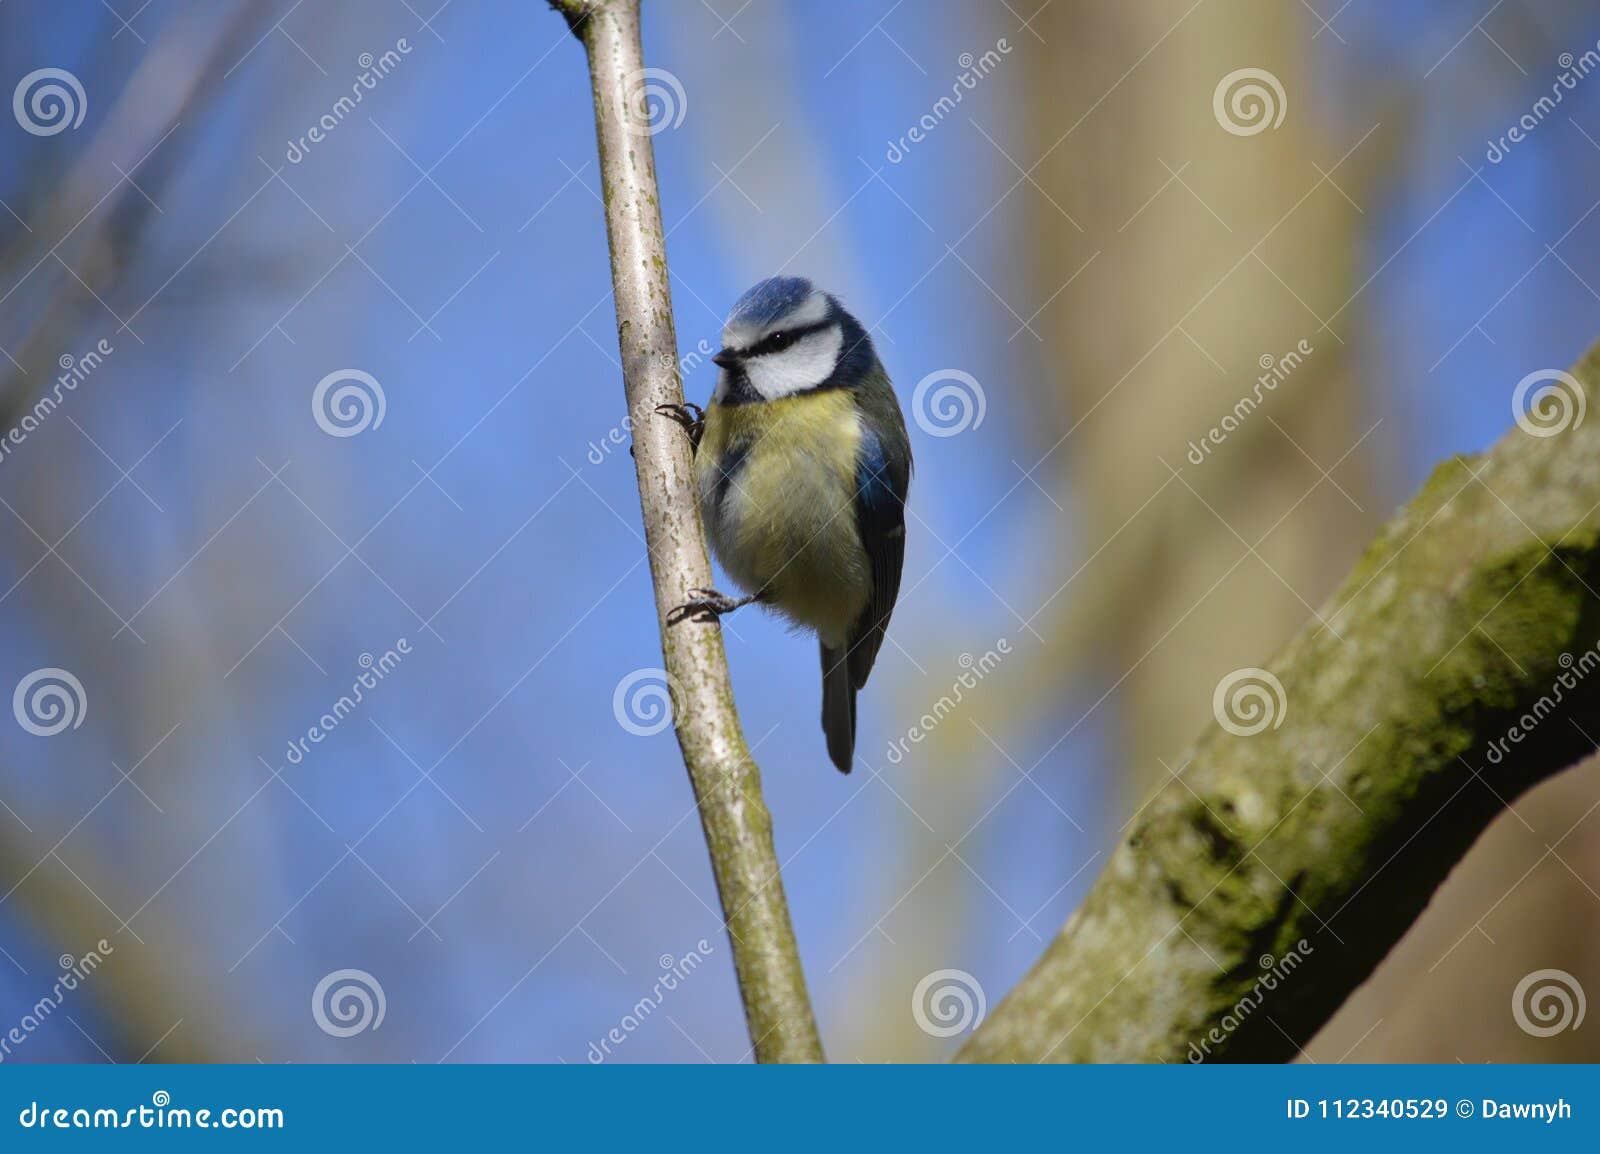 El pájaro del tit azul fotografió en Blackpool, Lancashire, Reino Unido